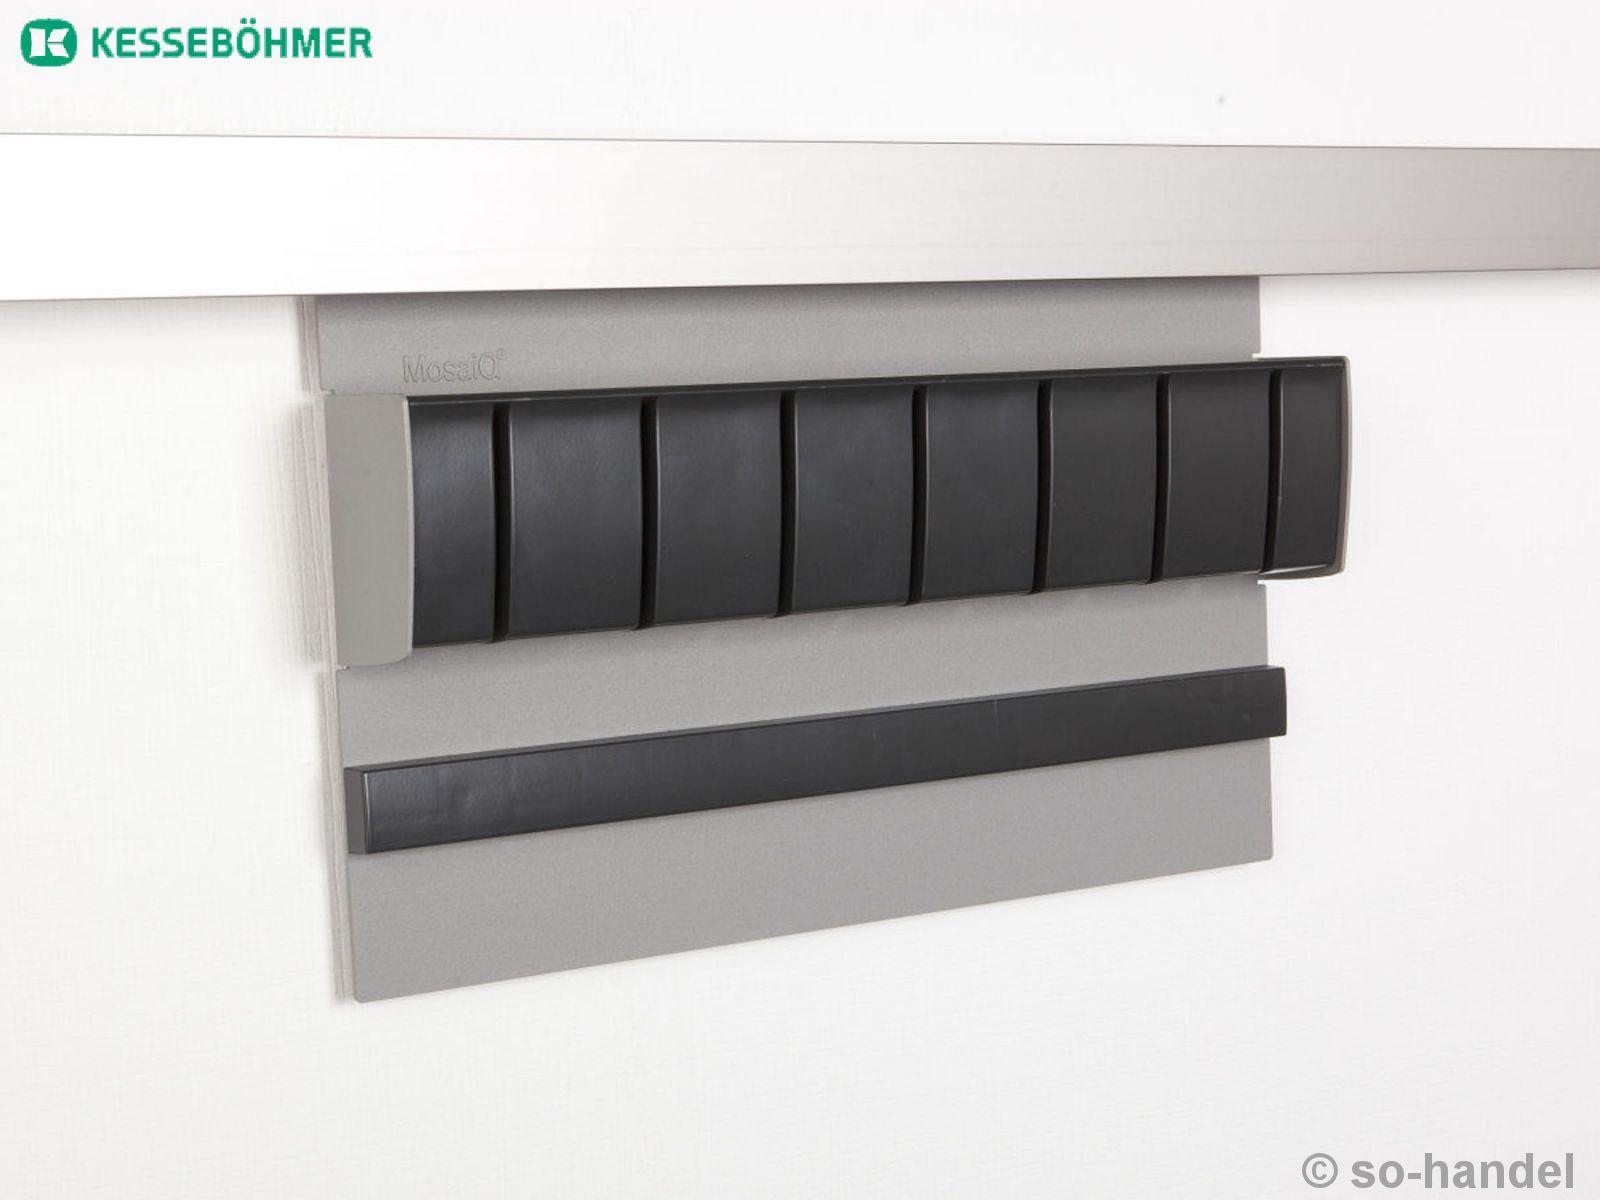 kesseb hmer linero mosaiq magnet messerhalter messer. Black Bedroom Furniture Sets. Home Design Ideas